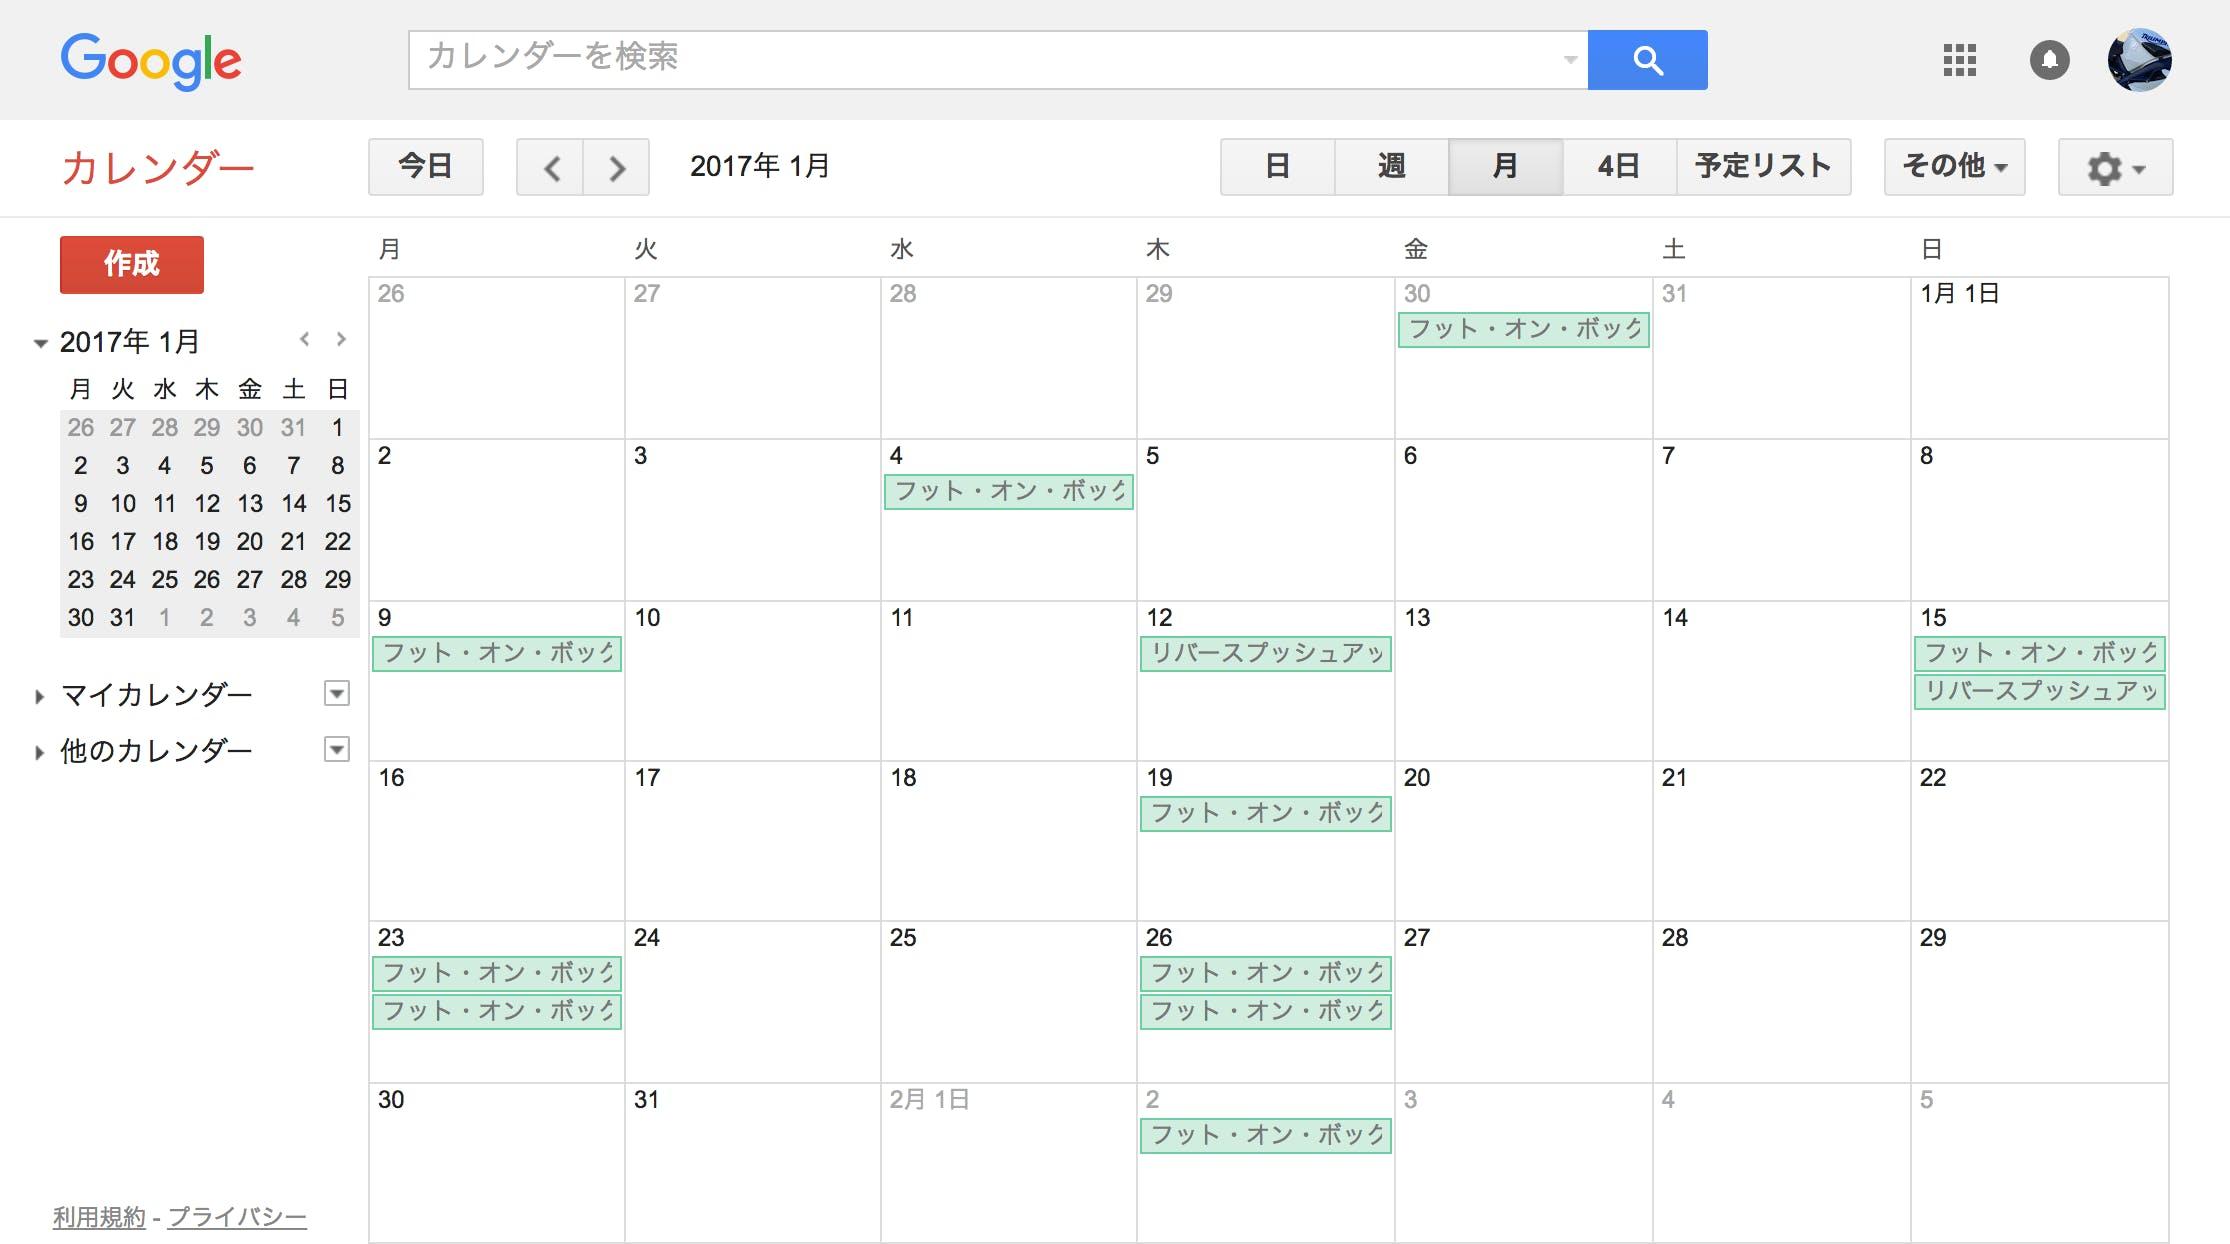 Google カレンダー - 2017年 1月.png